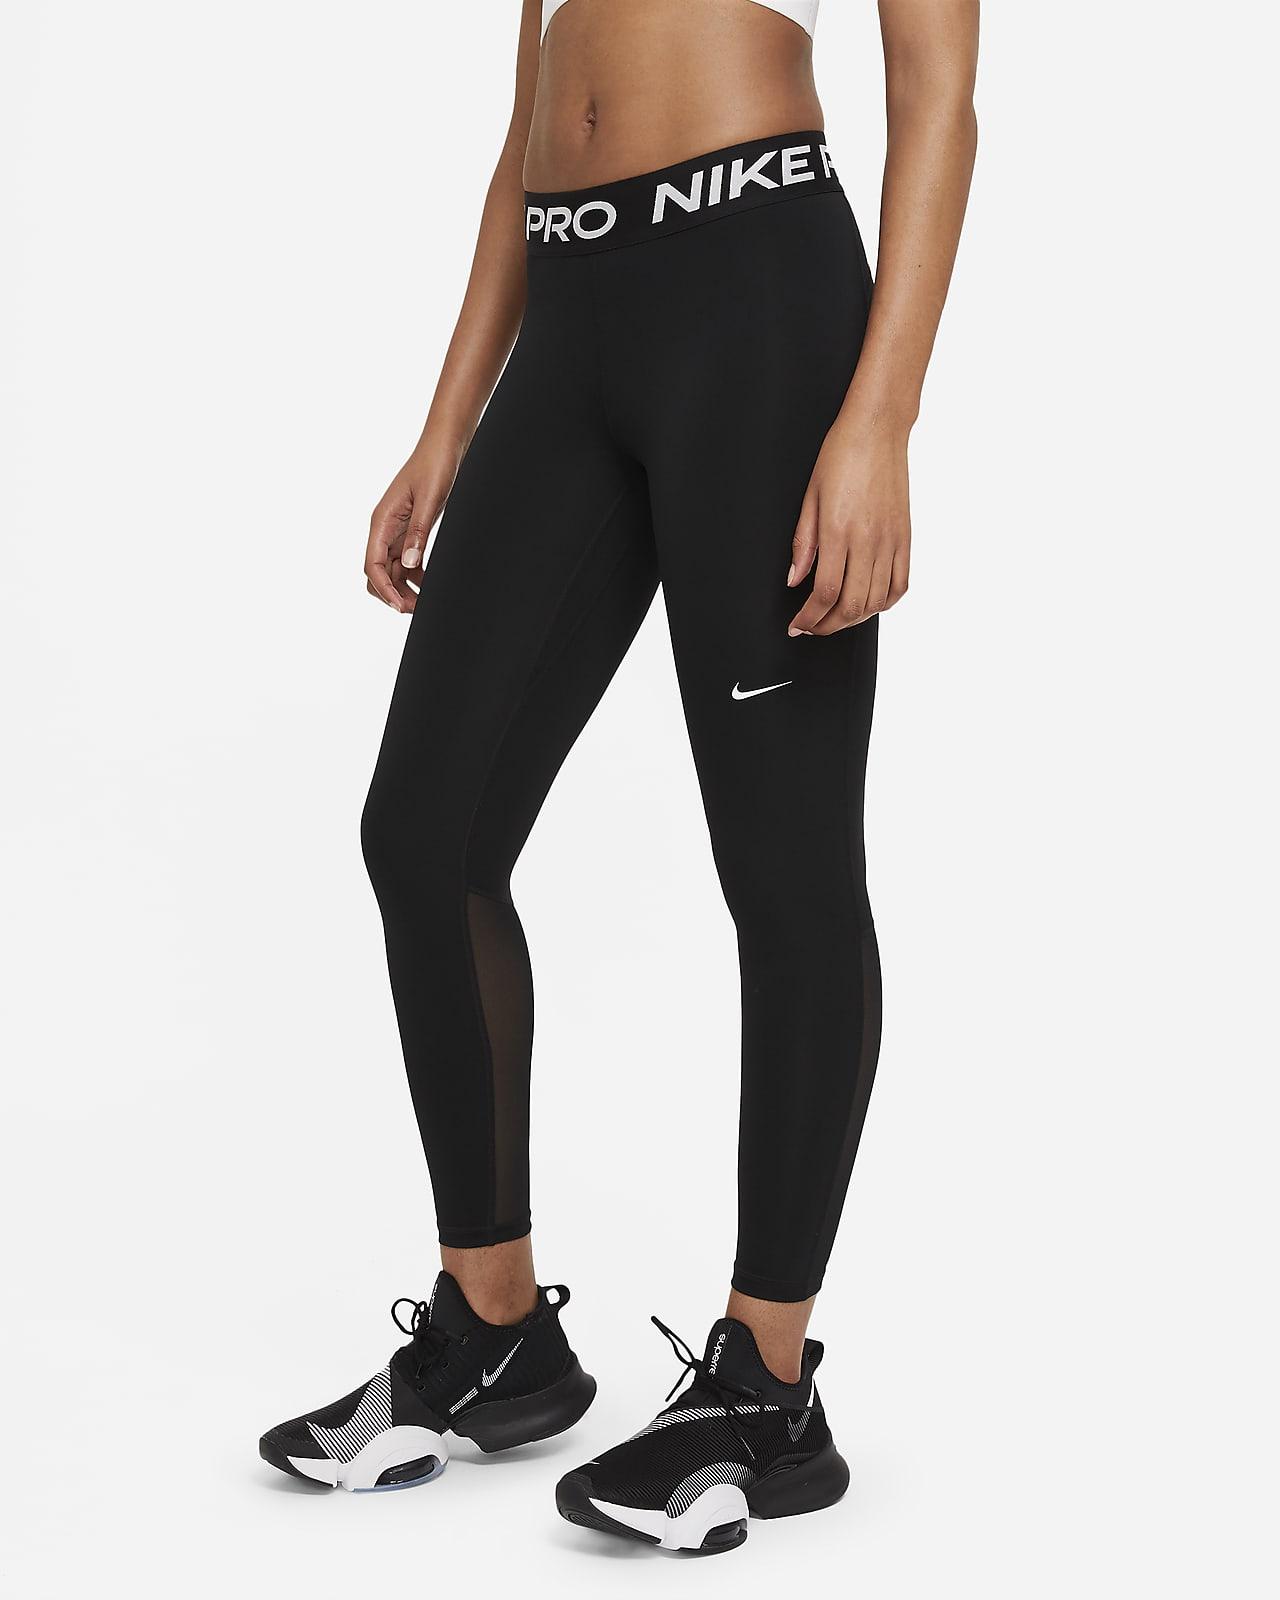 Nike Pro Women's Mid-Rise Leggings